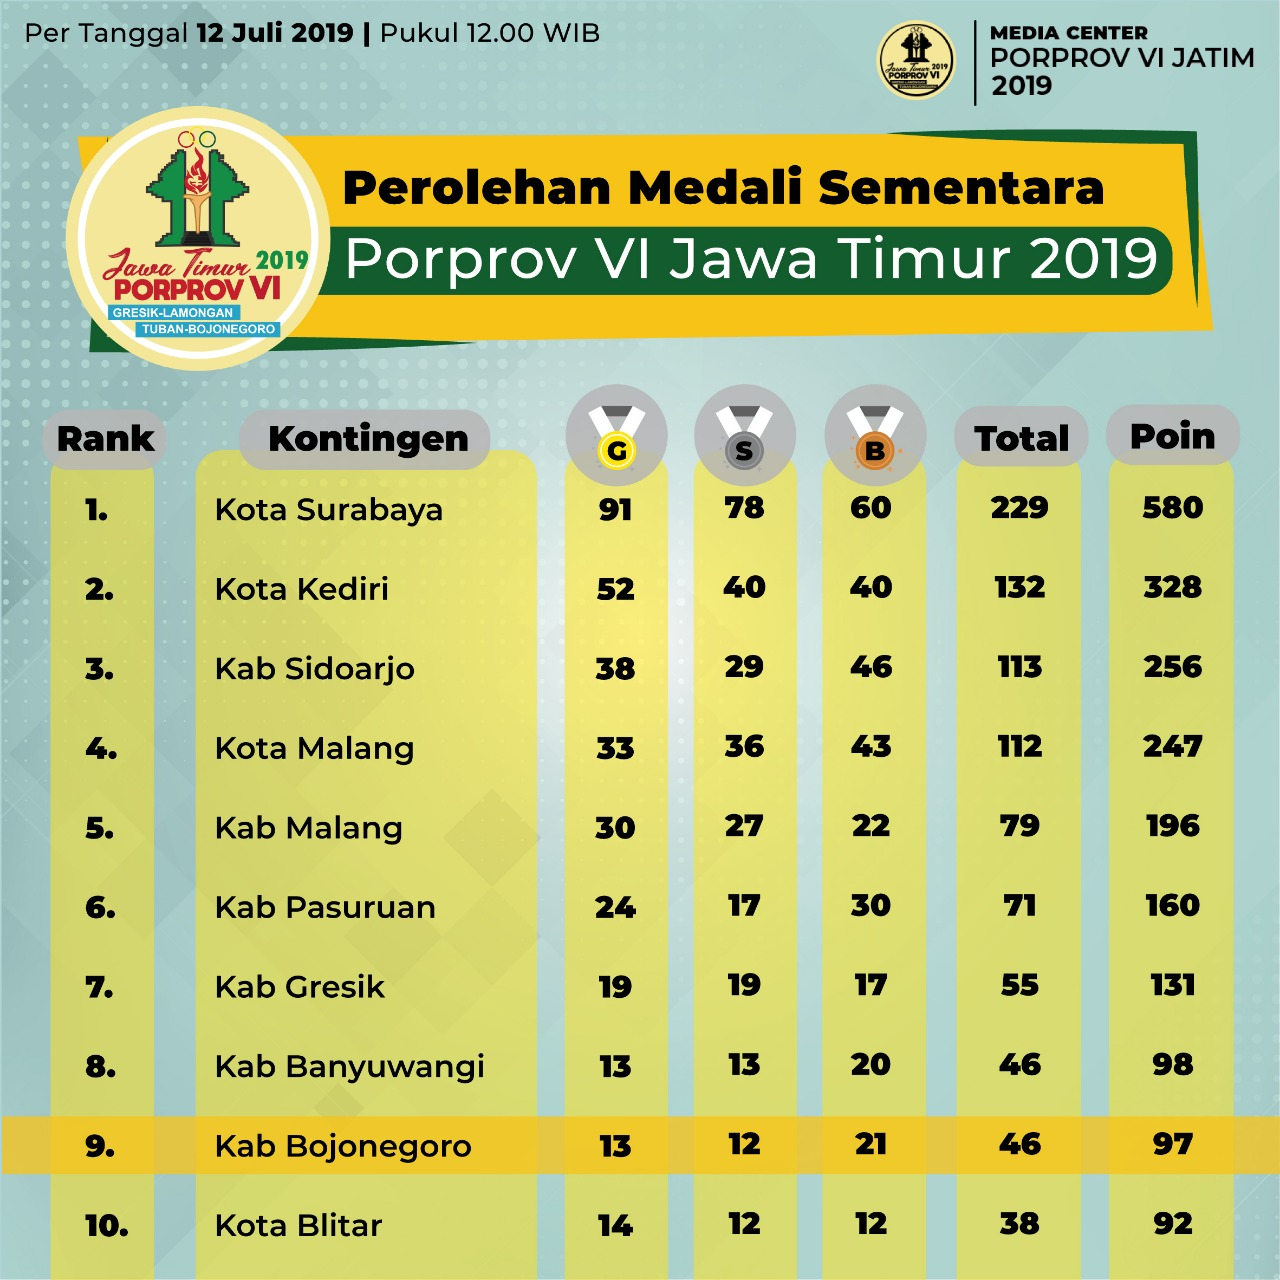 infografis perolehan medali sementara, per tanggal 12 Juli 2019, pukul 12.00